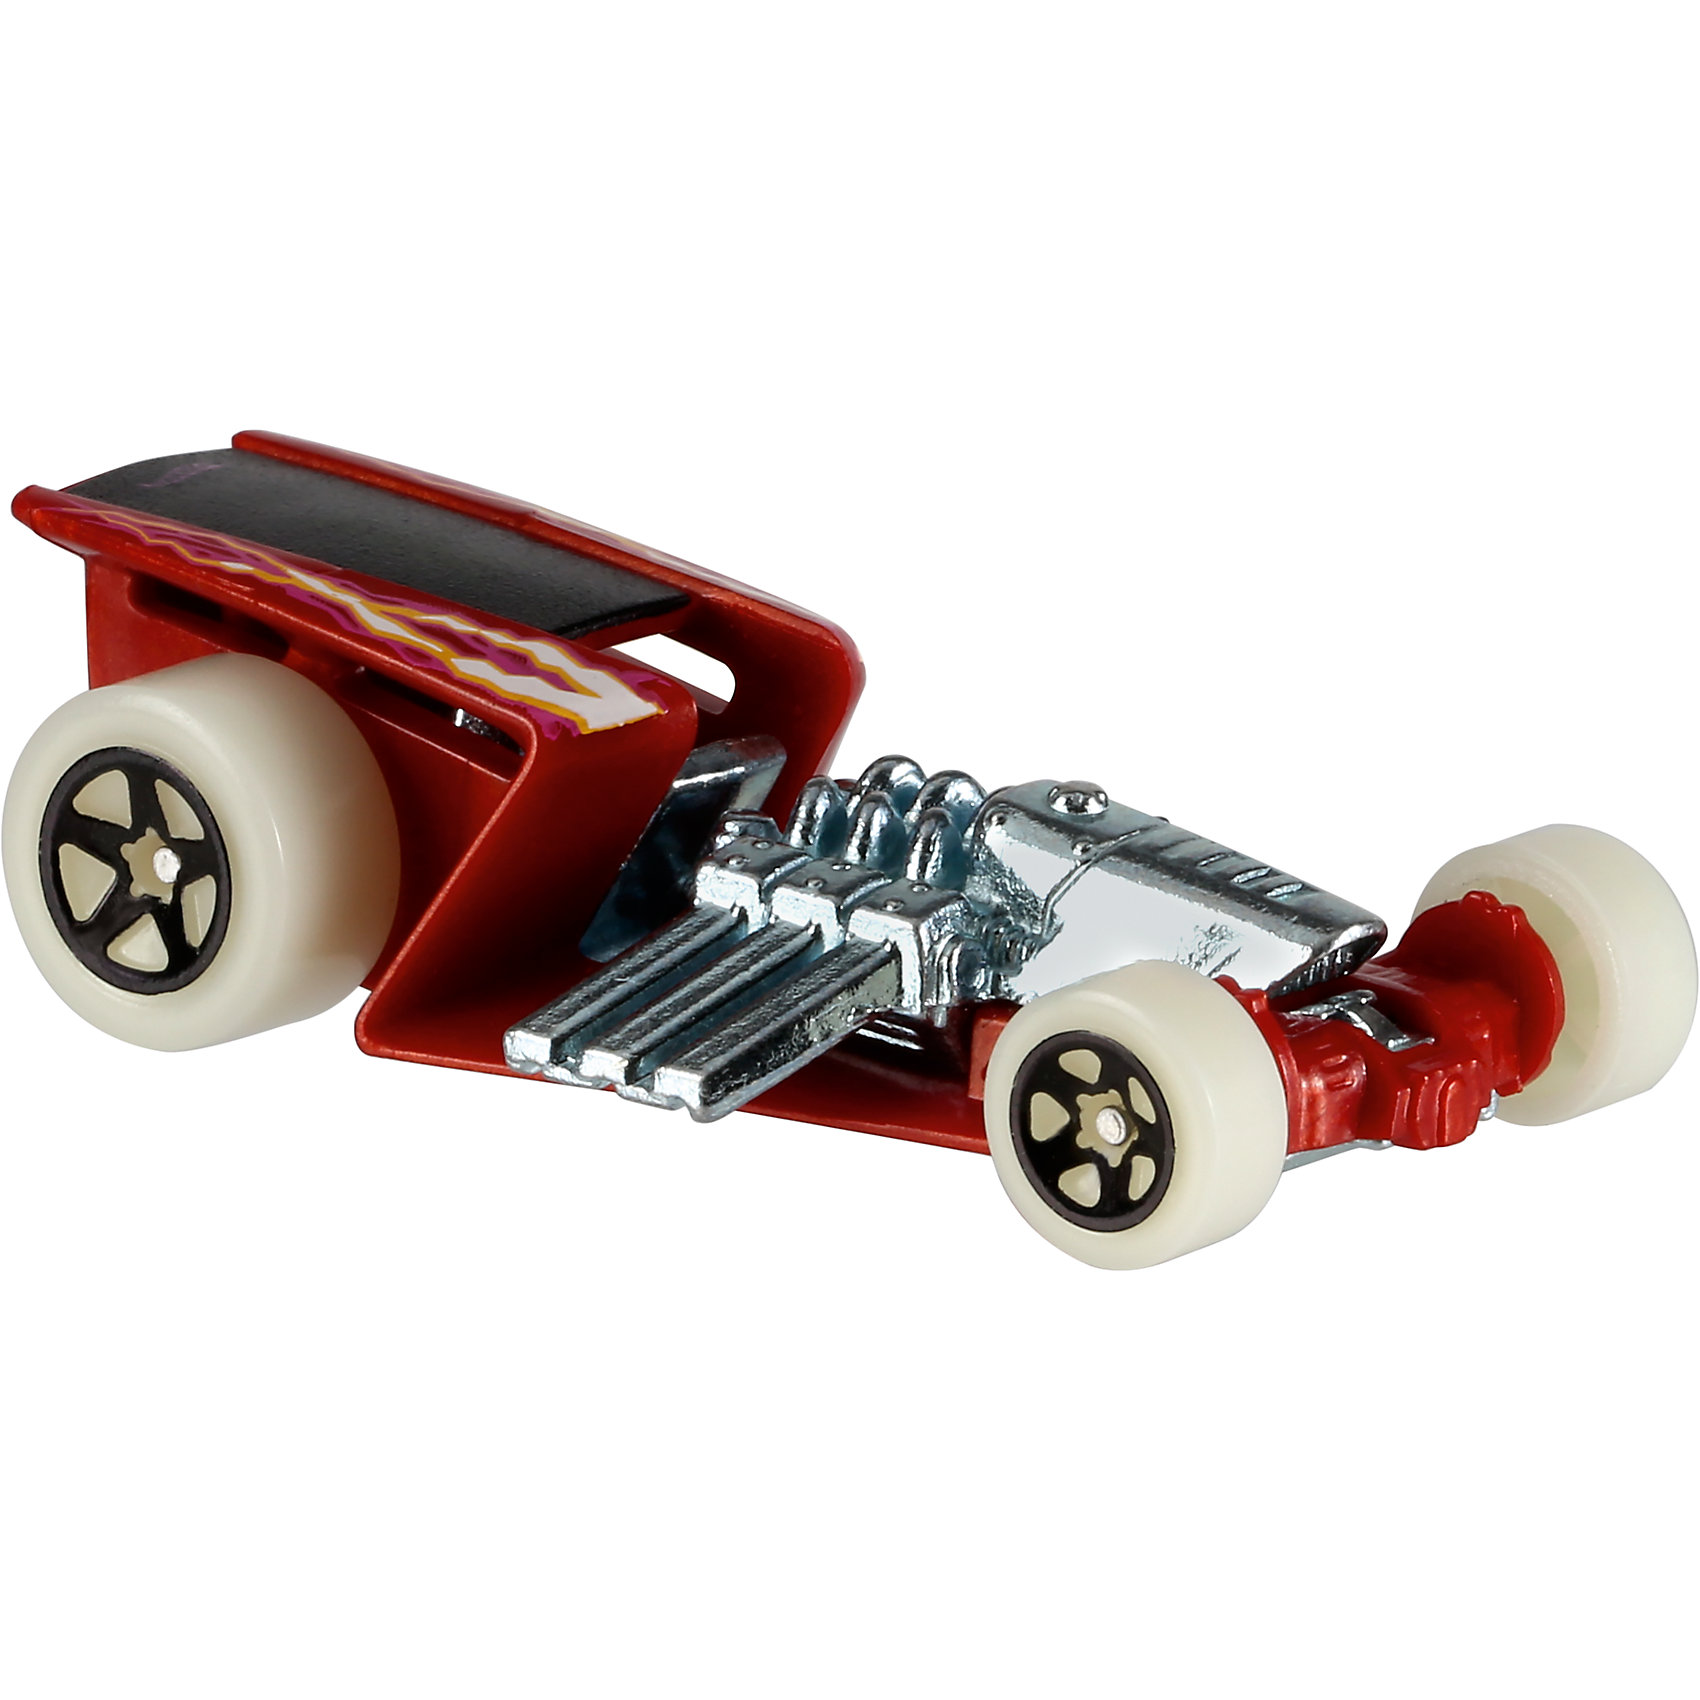 Базовая машинка Hot Wheels, Z-RodМашинки<br><br><br>Ширина мм: 110<br>Глубина мм: 45<br>Высота мм: 110<br>Вес г: 30<br>Возраст от месяцев: 36<br>Возраст до месяцев: 96<br>Пол: Мужской<br>Возраст: Детский<br>SKU: 7111100